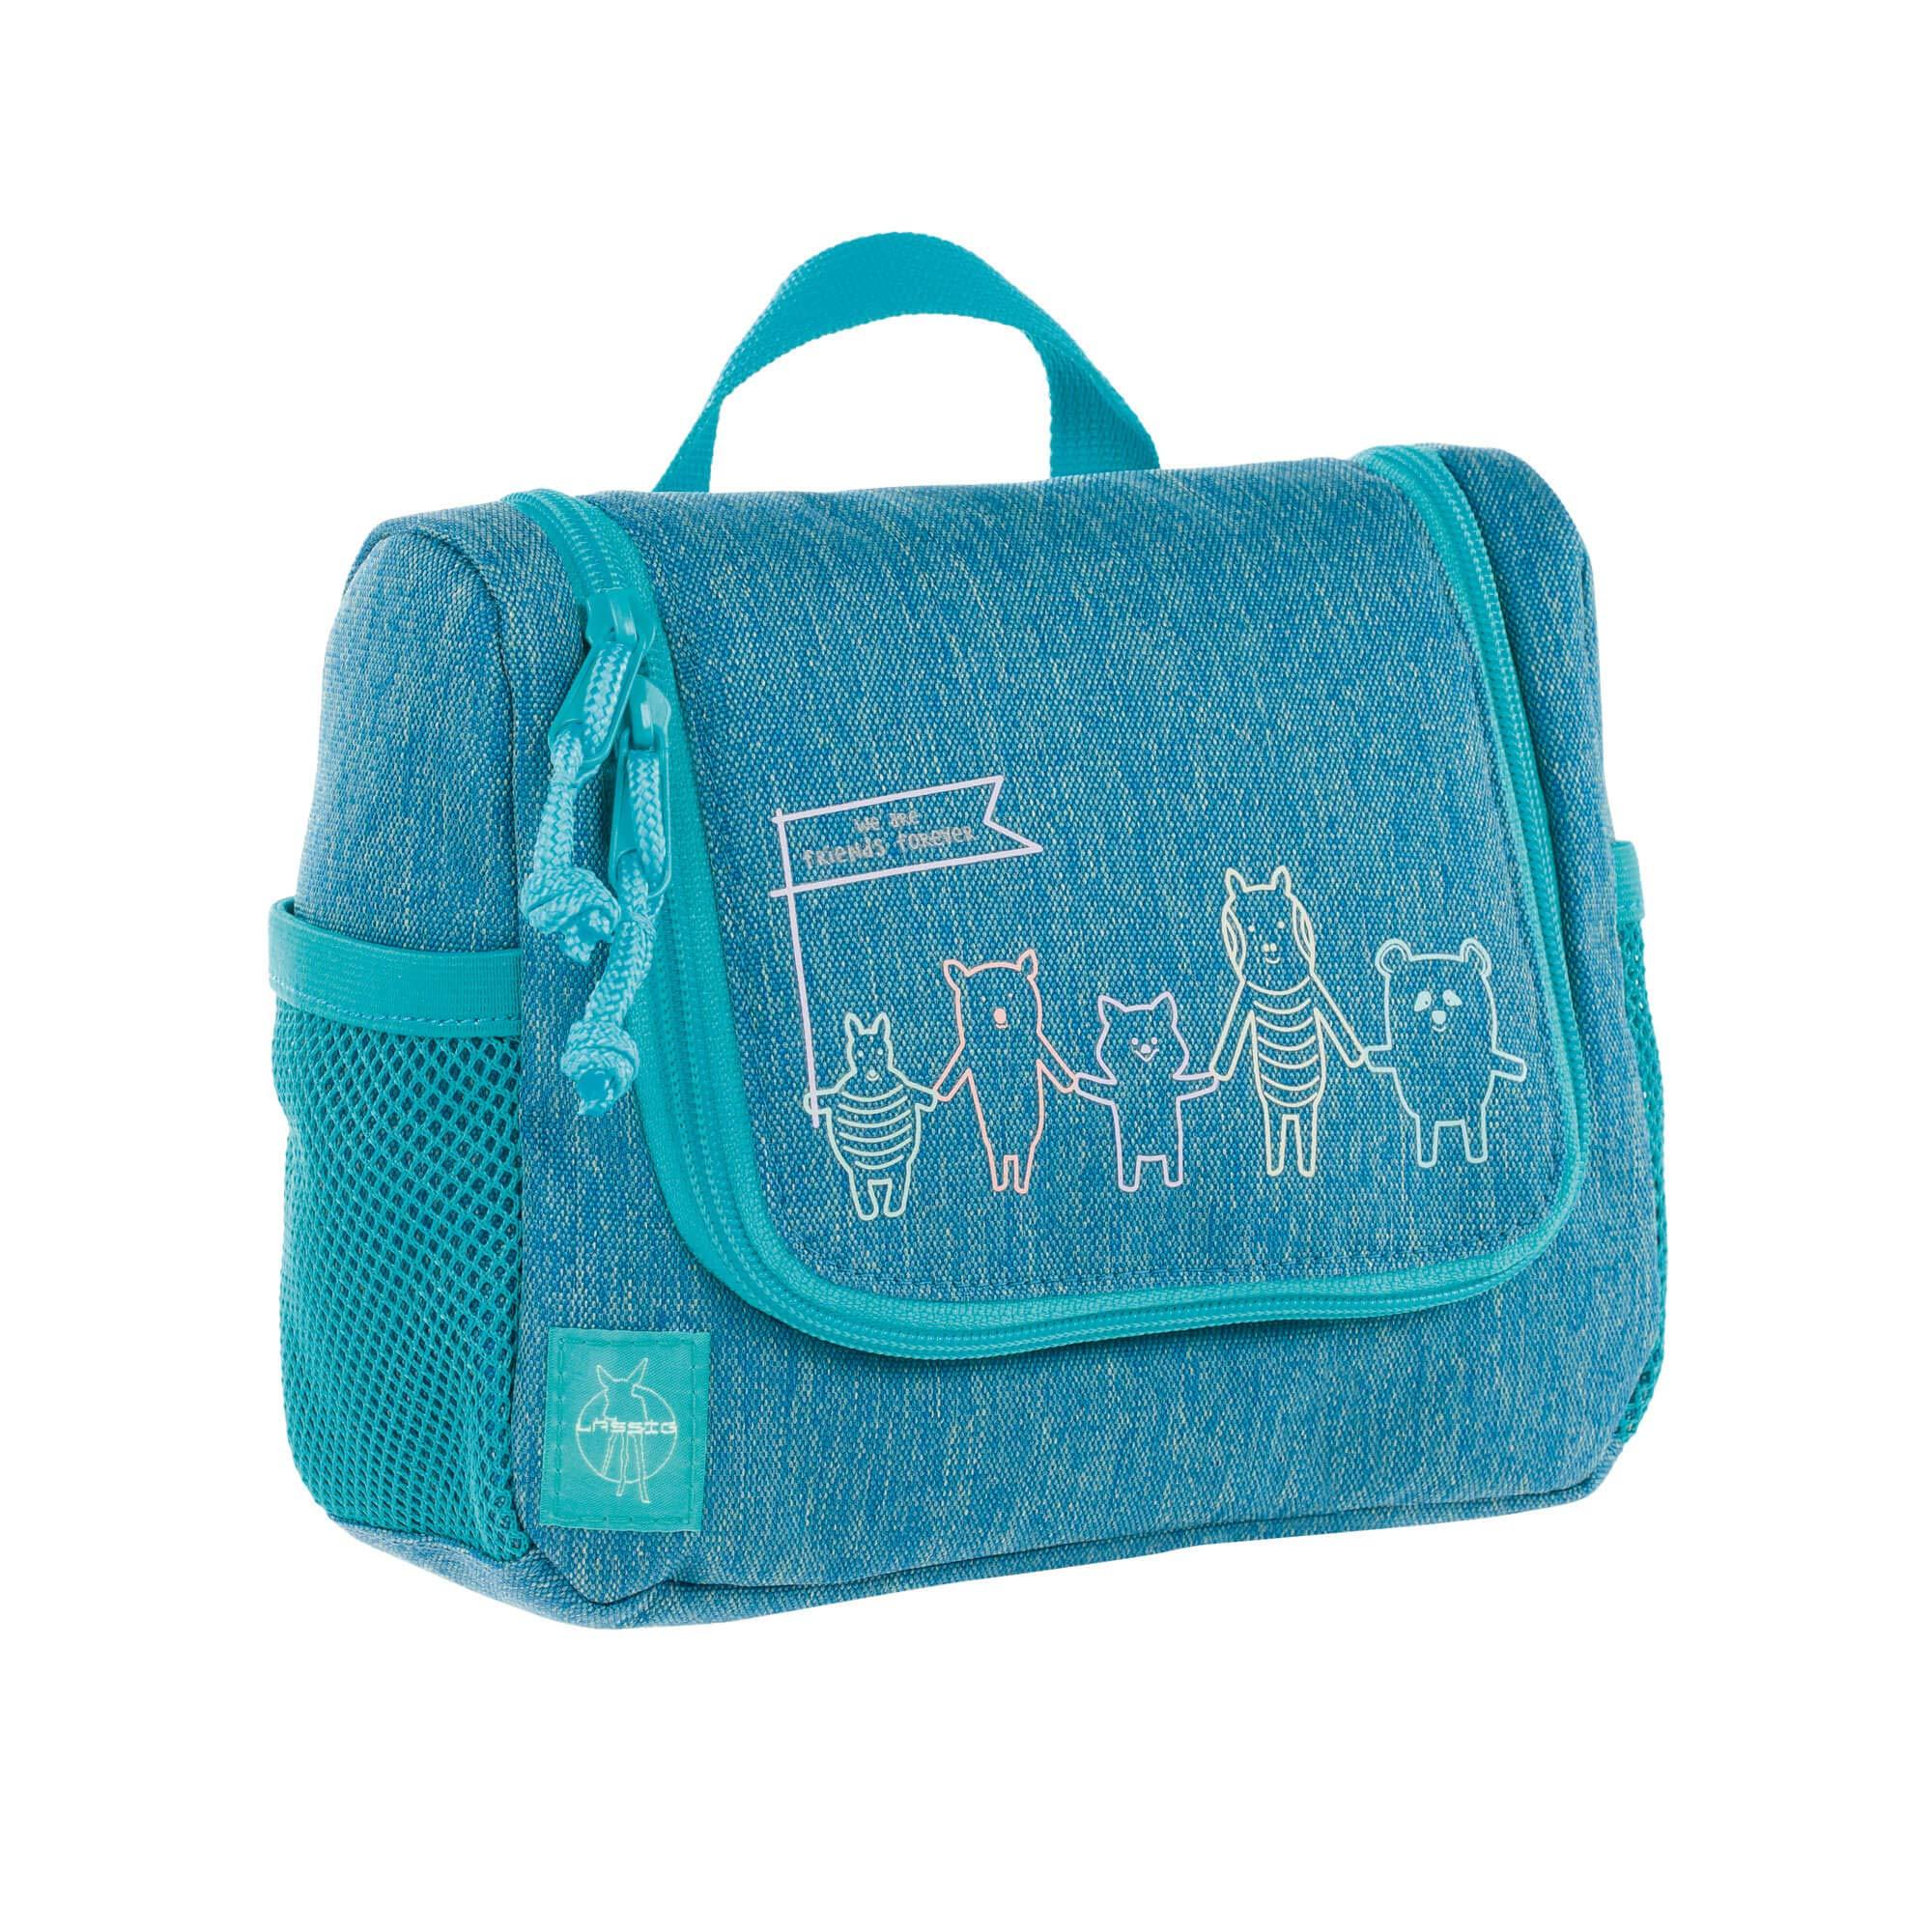 Lässig Mini Washbag, About Friends Mélange Grey